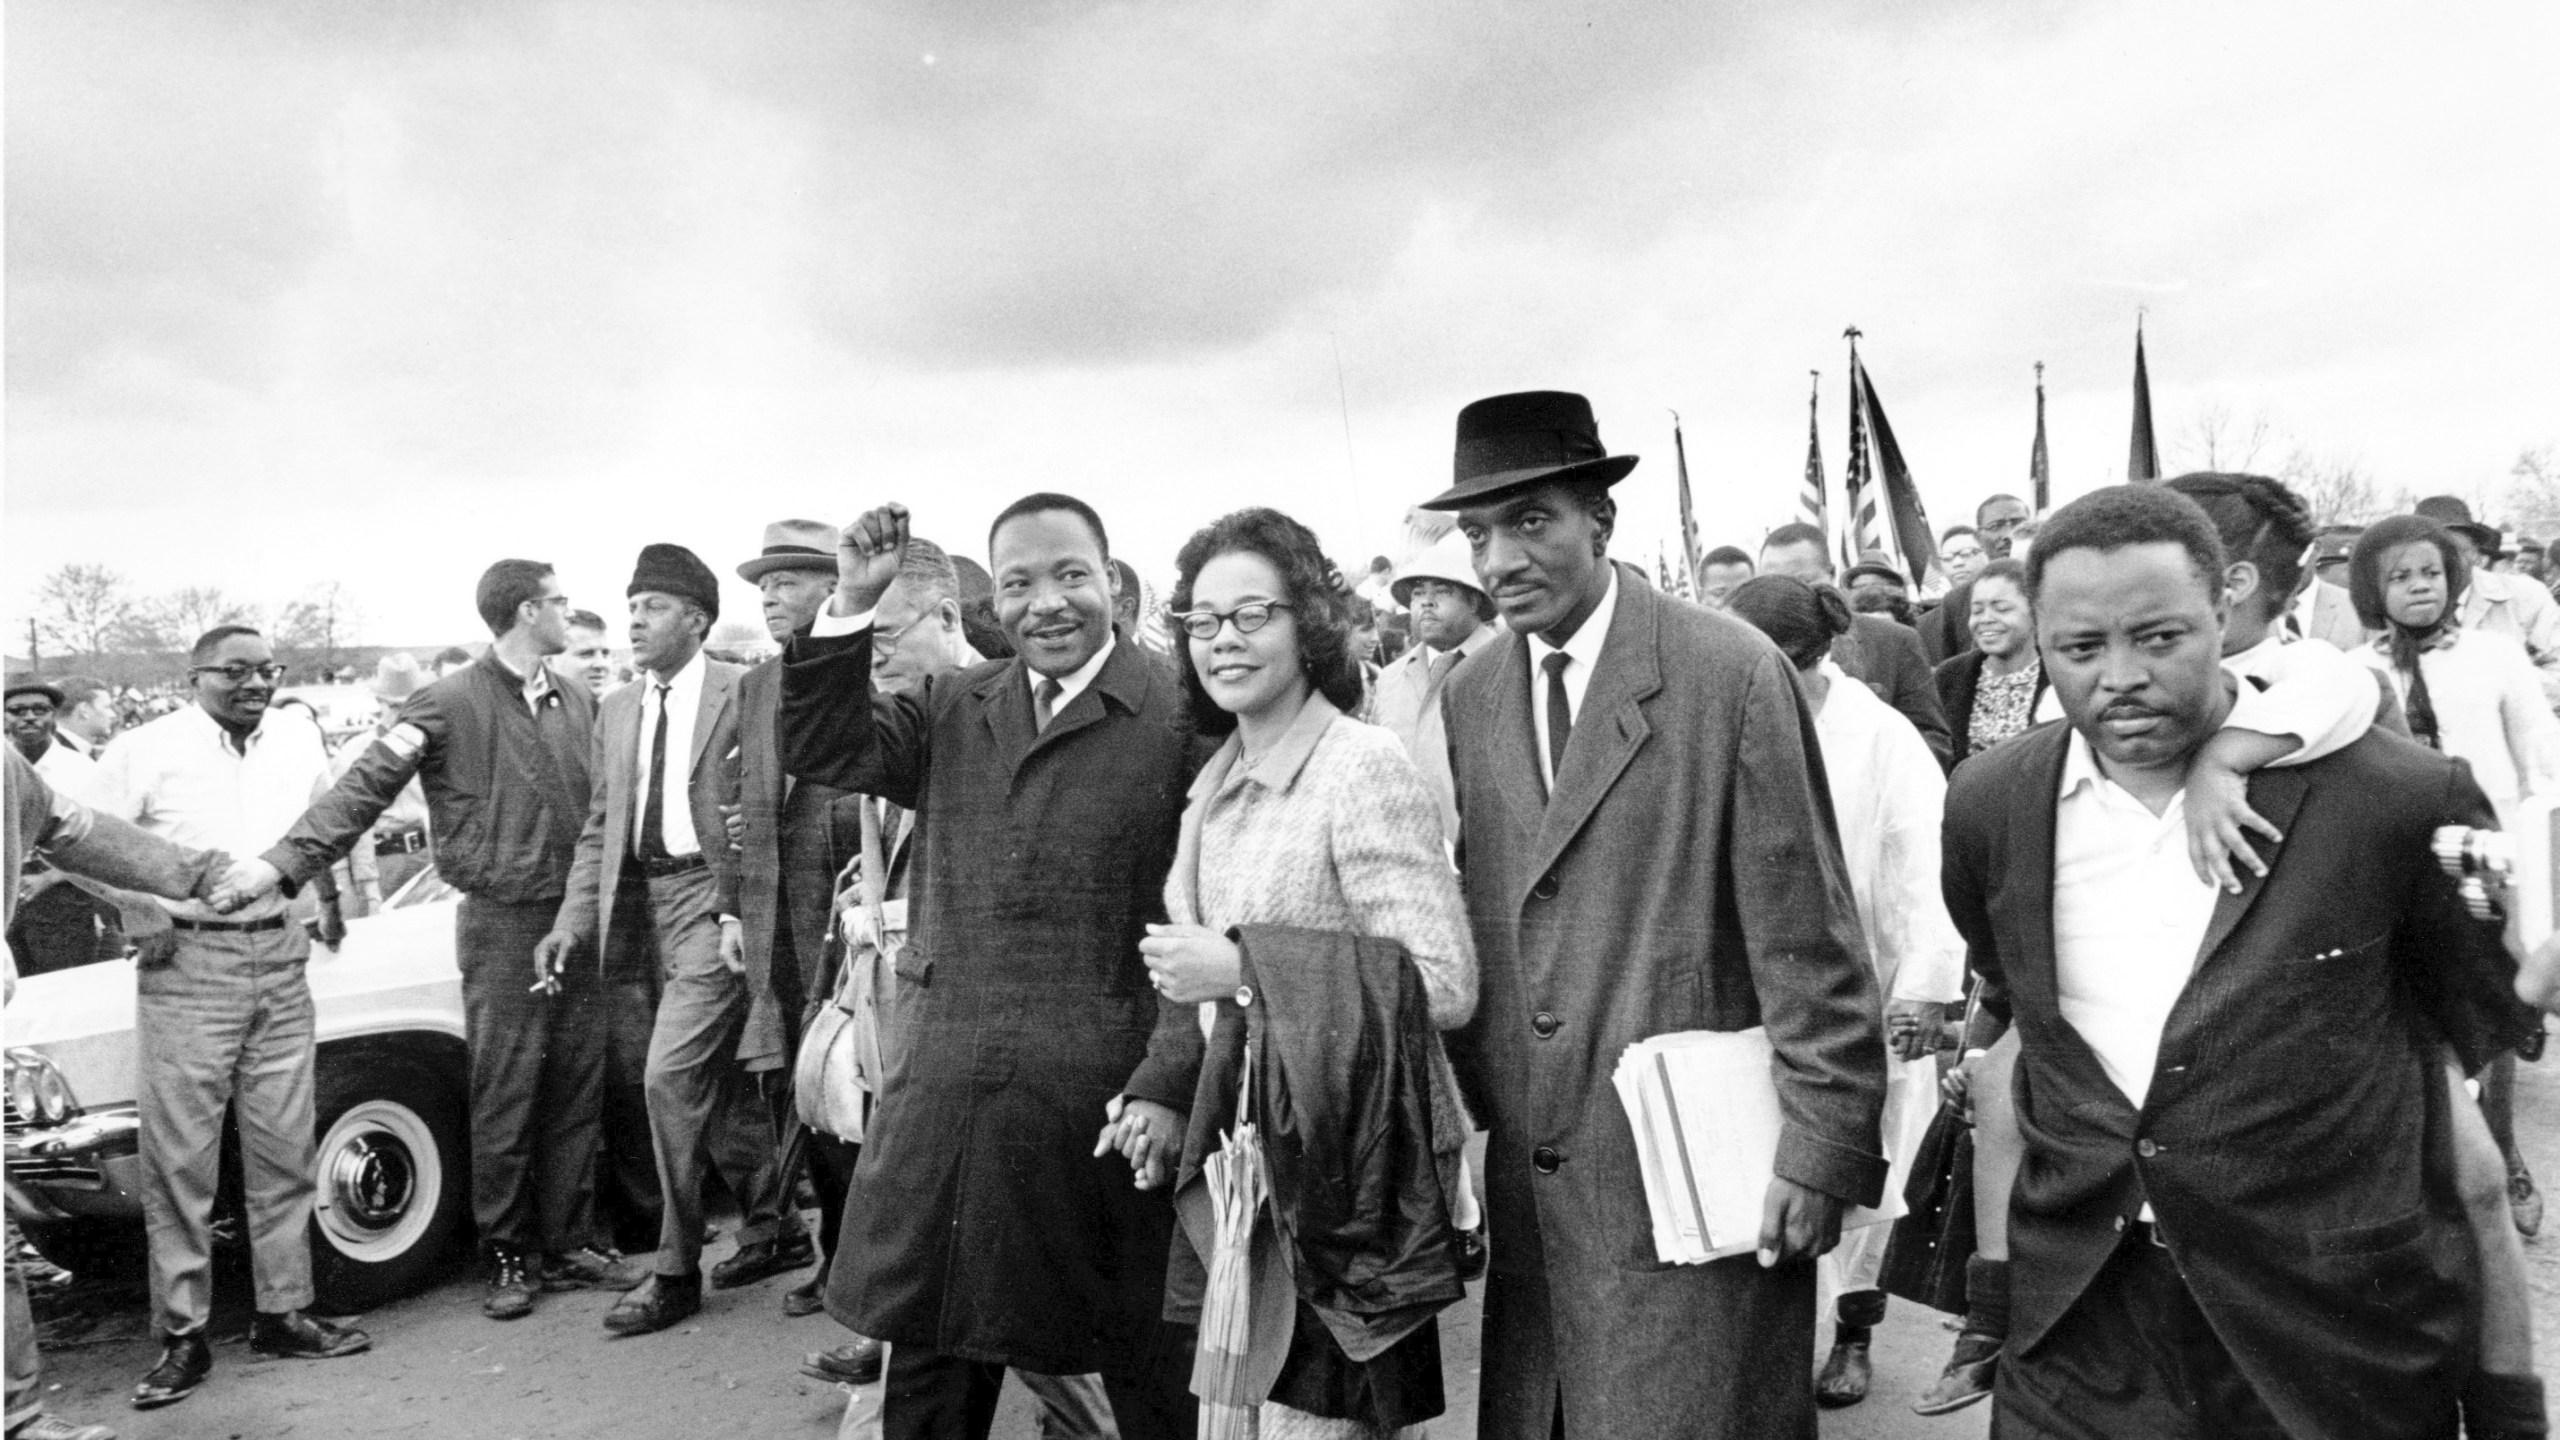 Martin Luthur King Jr., Coretta Scott King